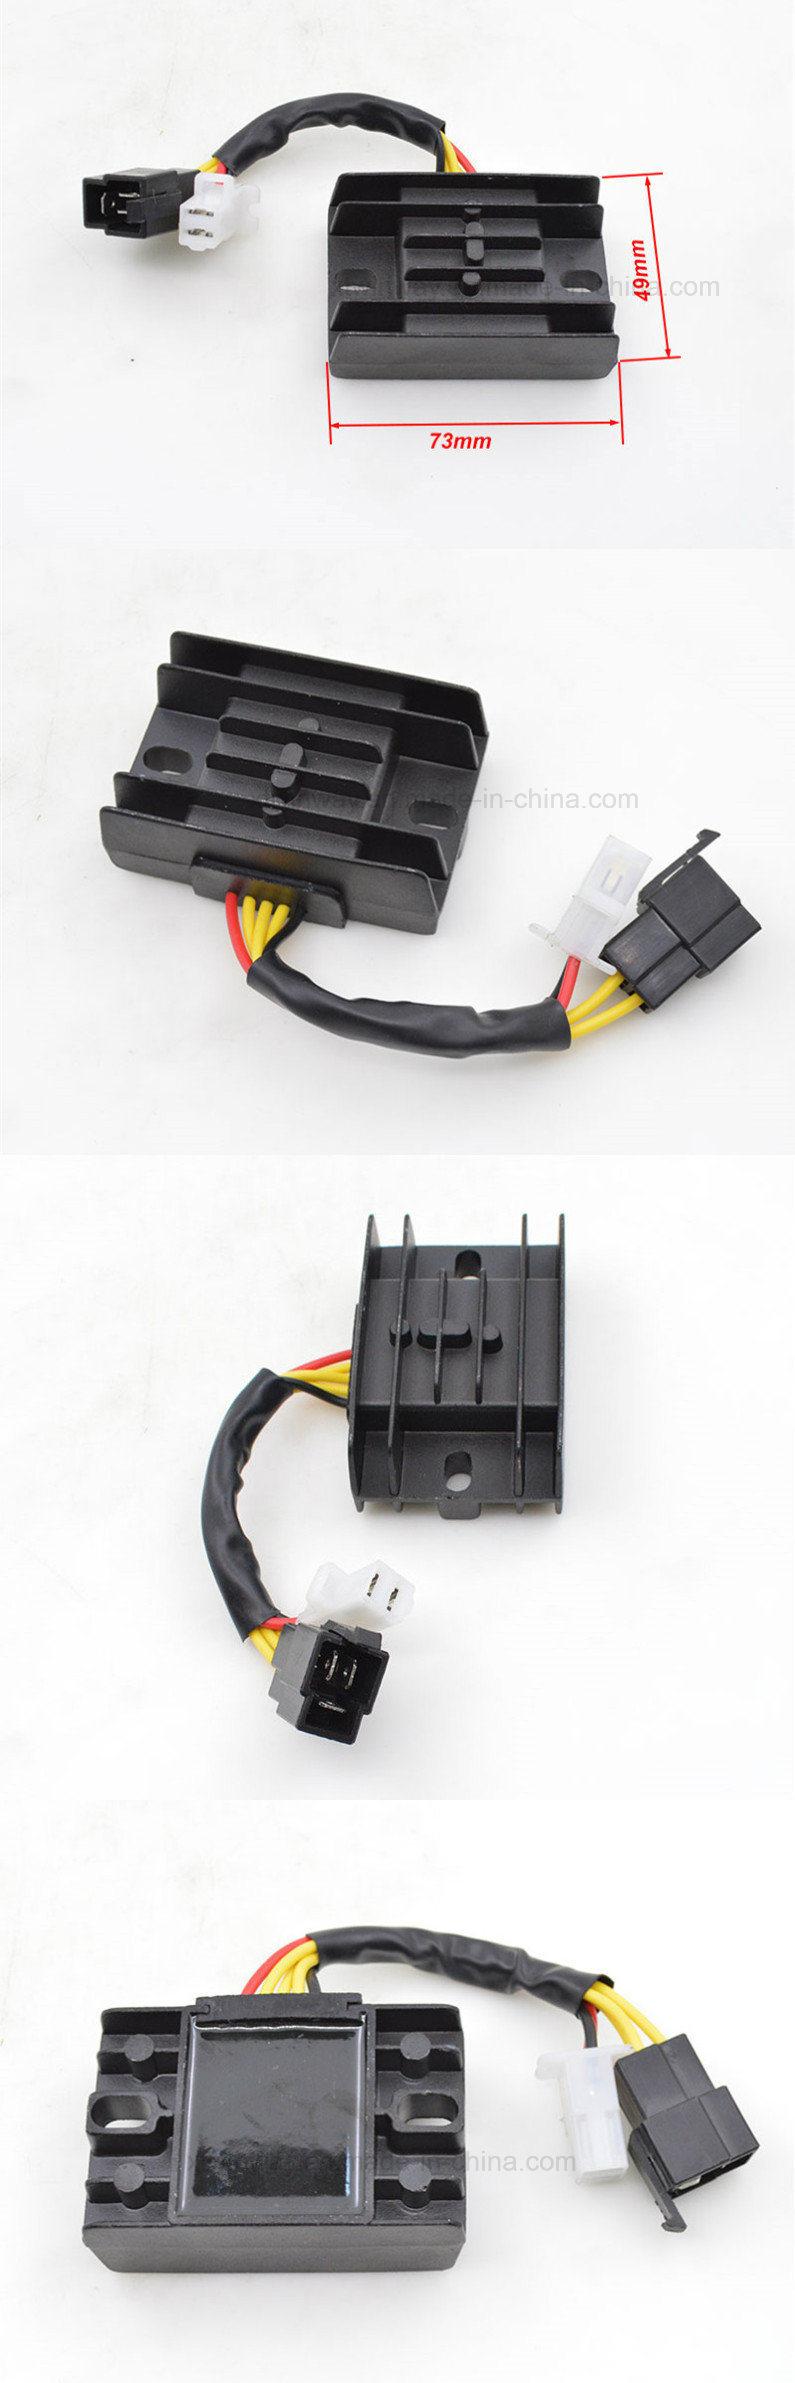 Ww-8201, Motorcycle Suzuki Gn125 GS125 Motorcycle 5 Wires Voltage Regulator  Rectifier   IBUYautoparts com